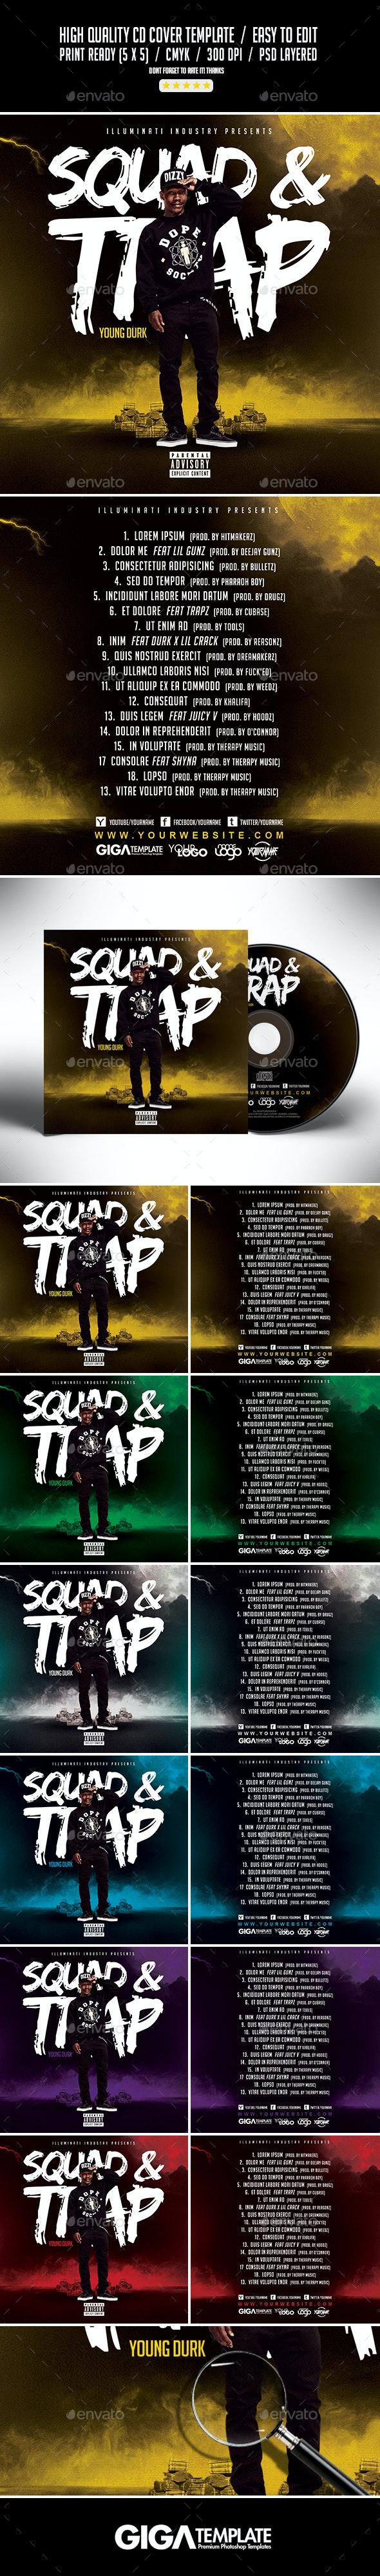 Squad & Trap | Hip-Hop Mixtape Album CD Cover Template - CD & DVD Artwork Print Templates